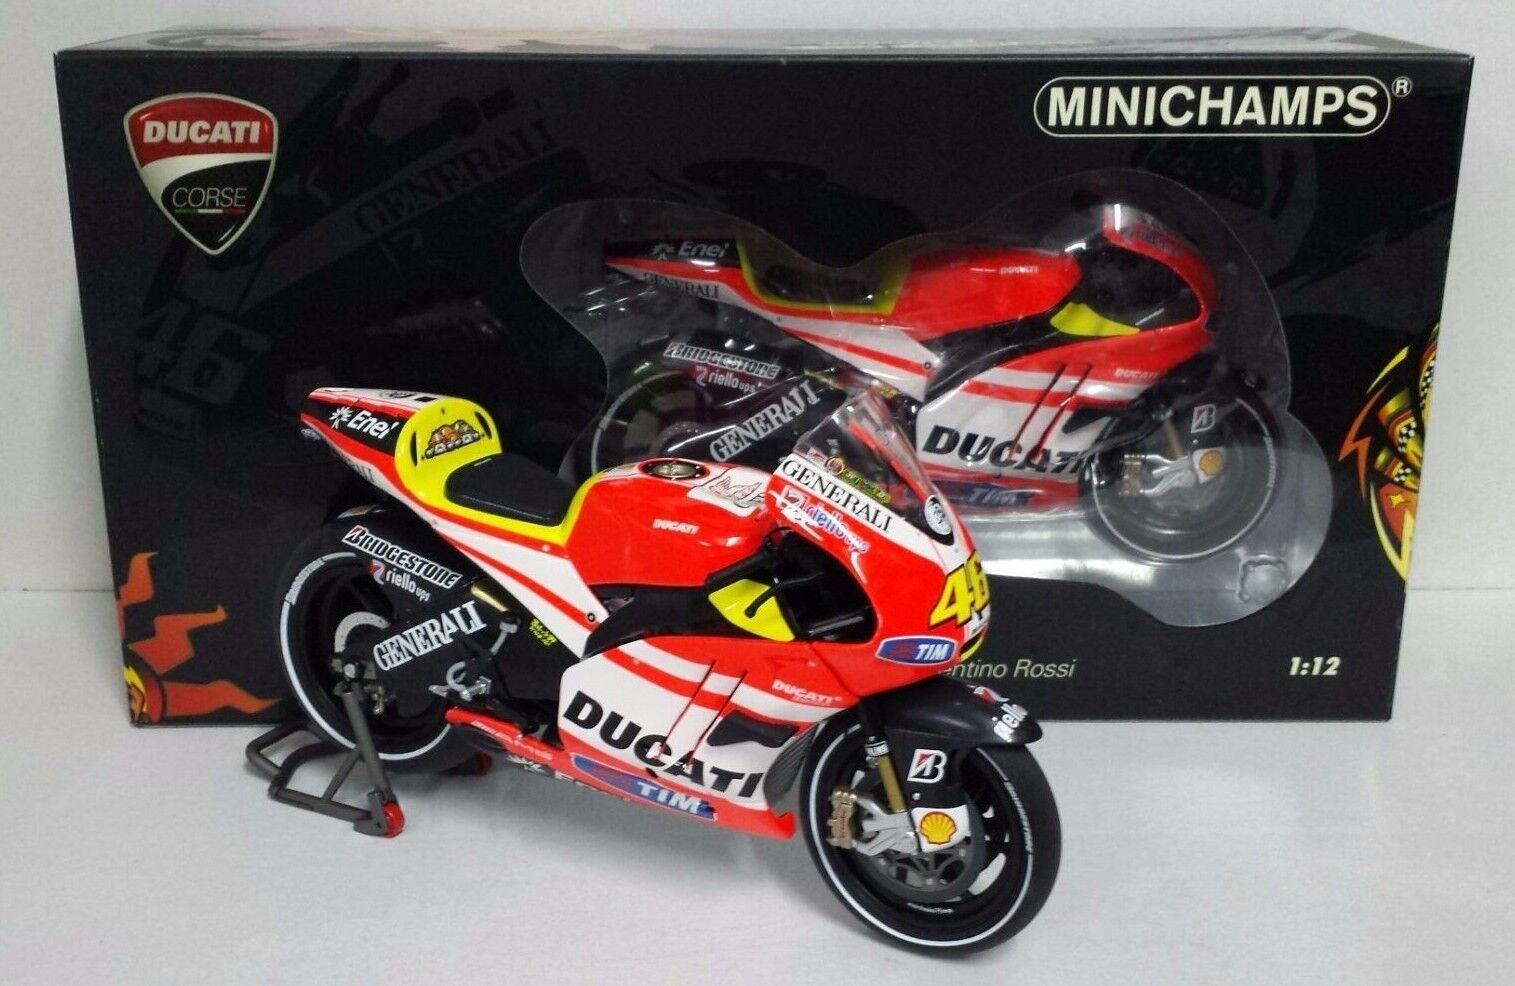 MINICHAMPS VALENTINO ROSSI 1 12 DUCATI MOTOGP  TEST SEPANG 2011  SOFT TIRES